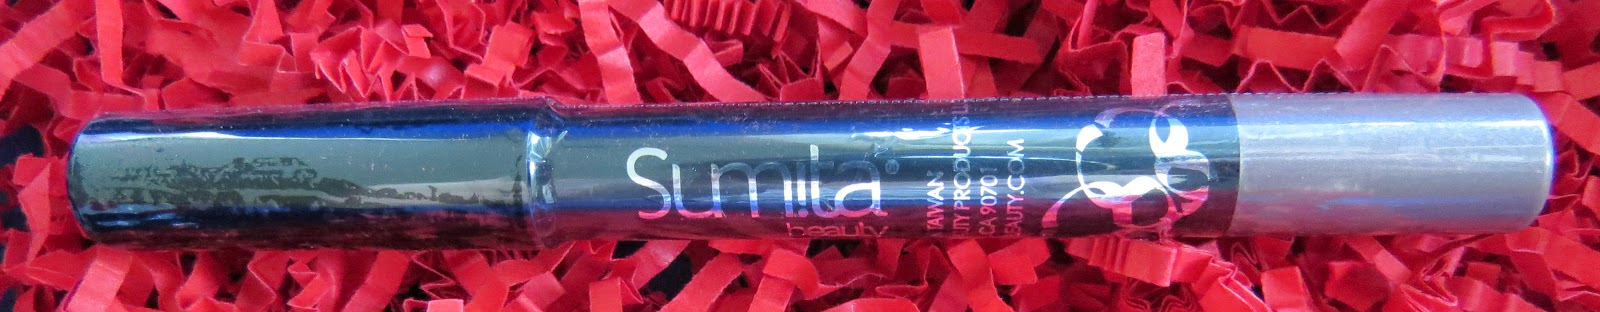 Sumita Beauty Champagne Eye shadow Pencil